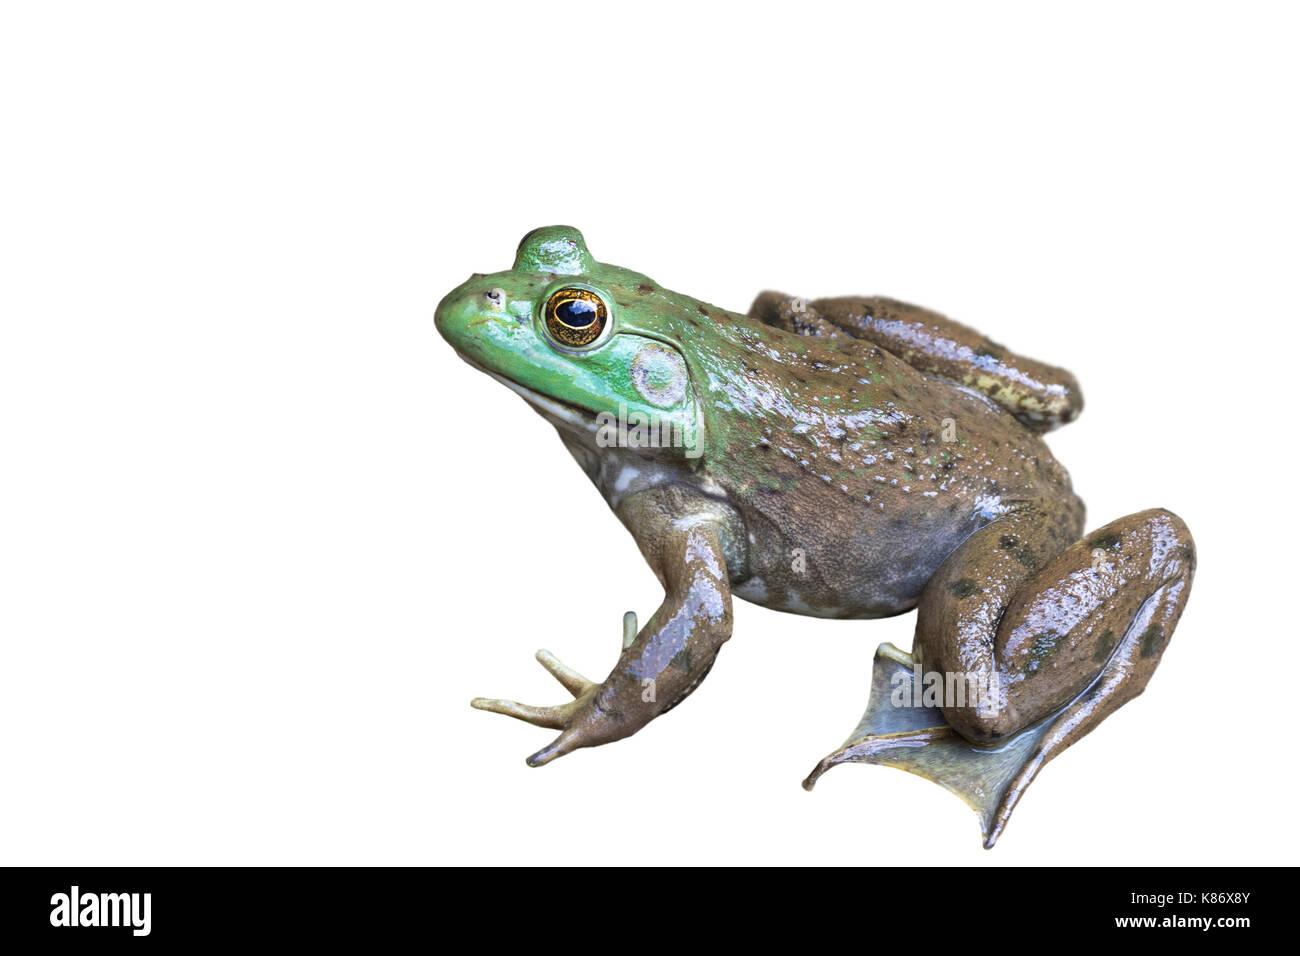 American bullfrog (Lithobates catesbeianus), isolati su sfondo bianco Foto Stock